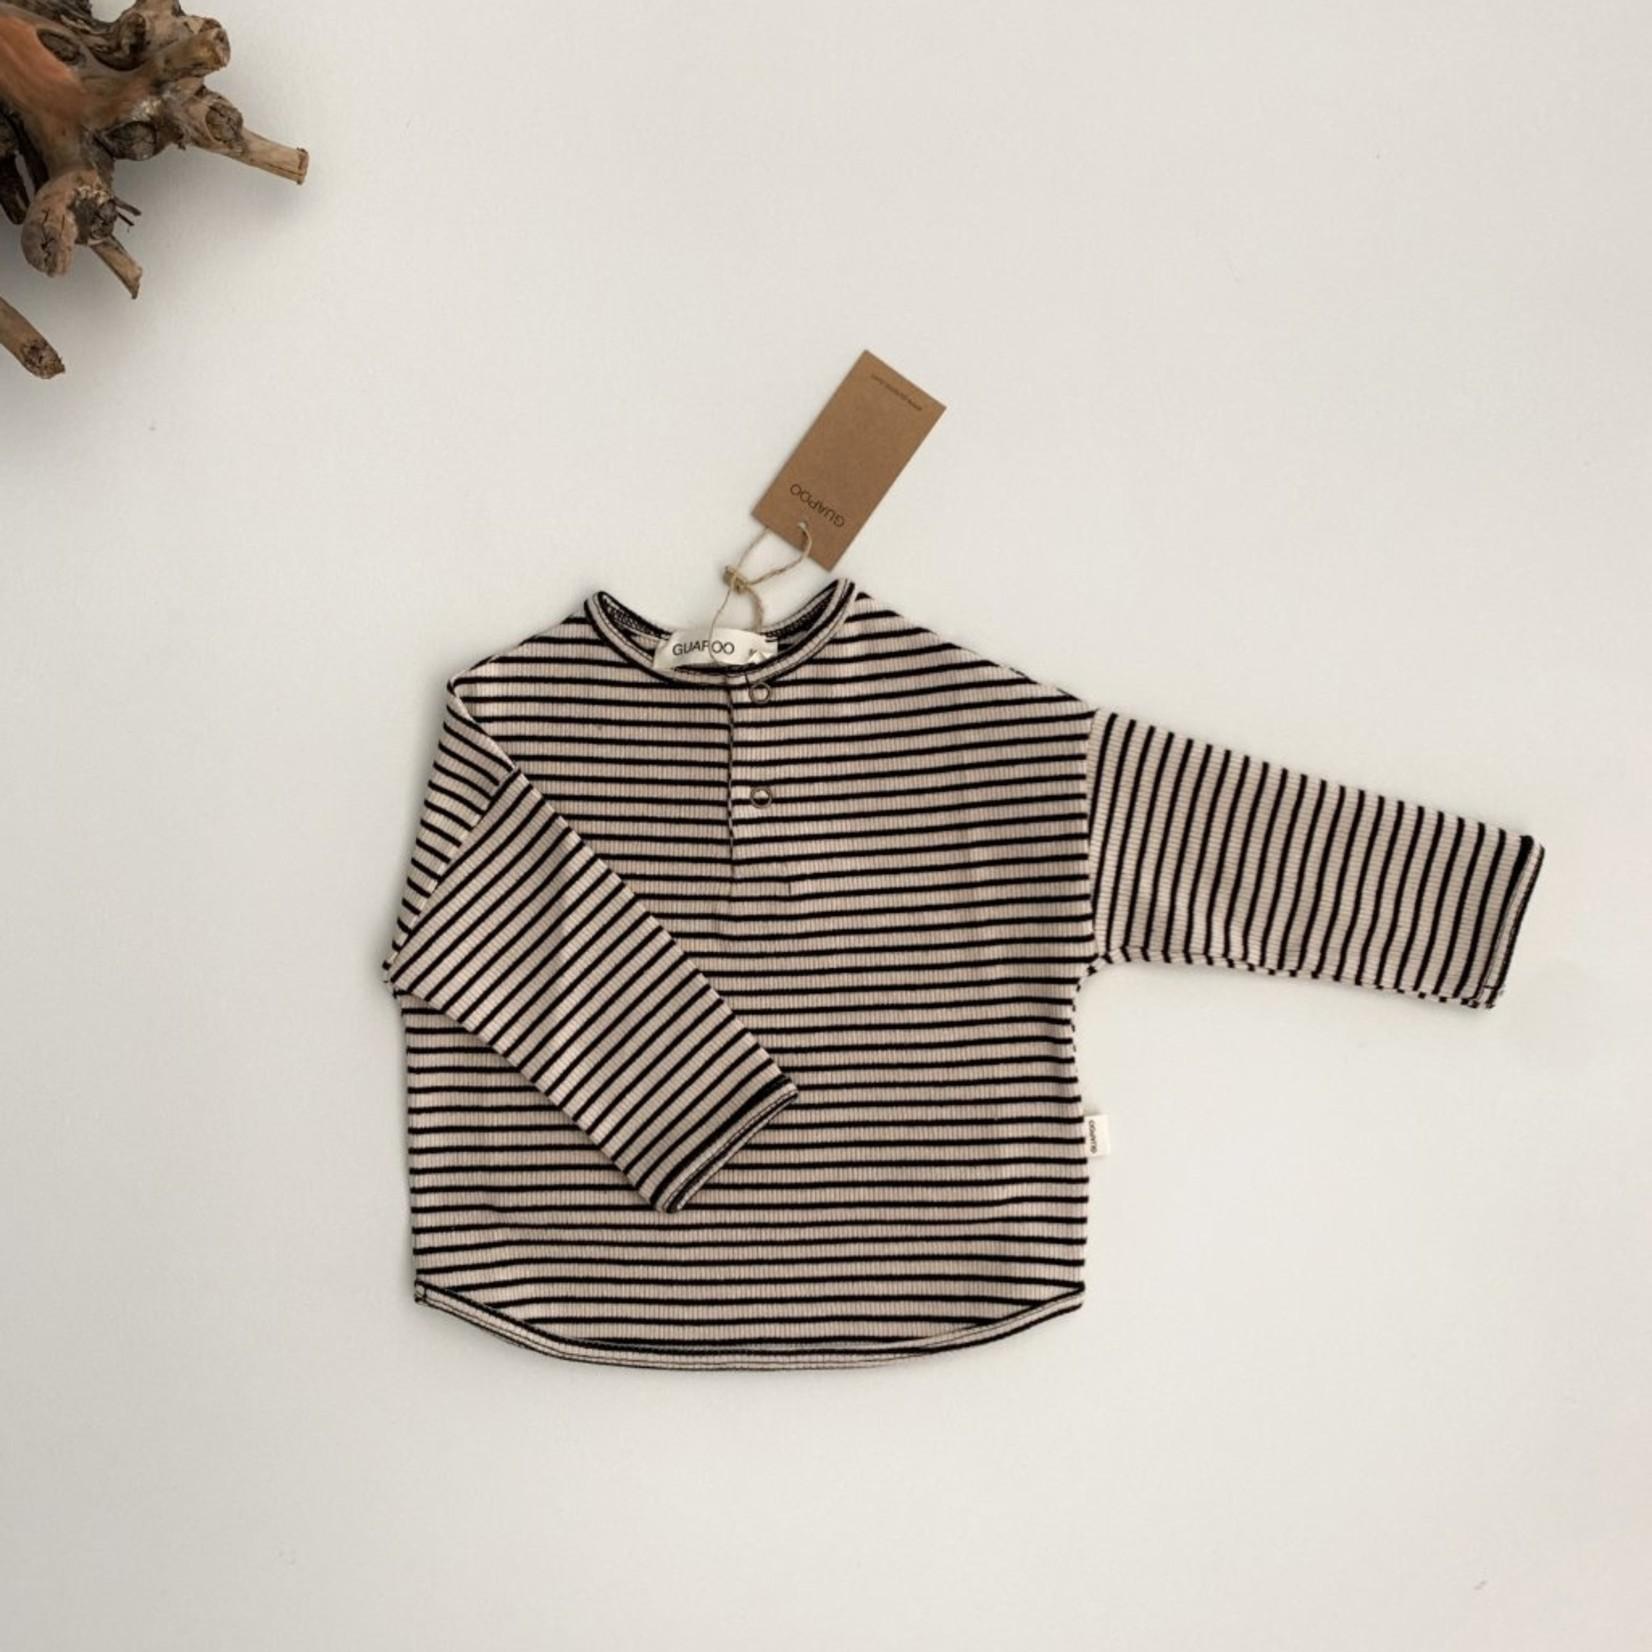 GUAPOO GUAPOO |Rib Shirt - Beige Stripes